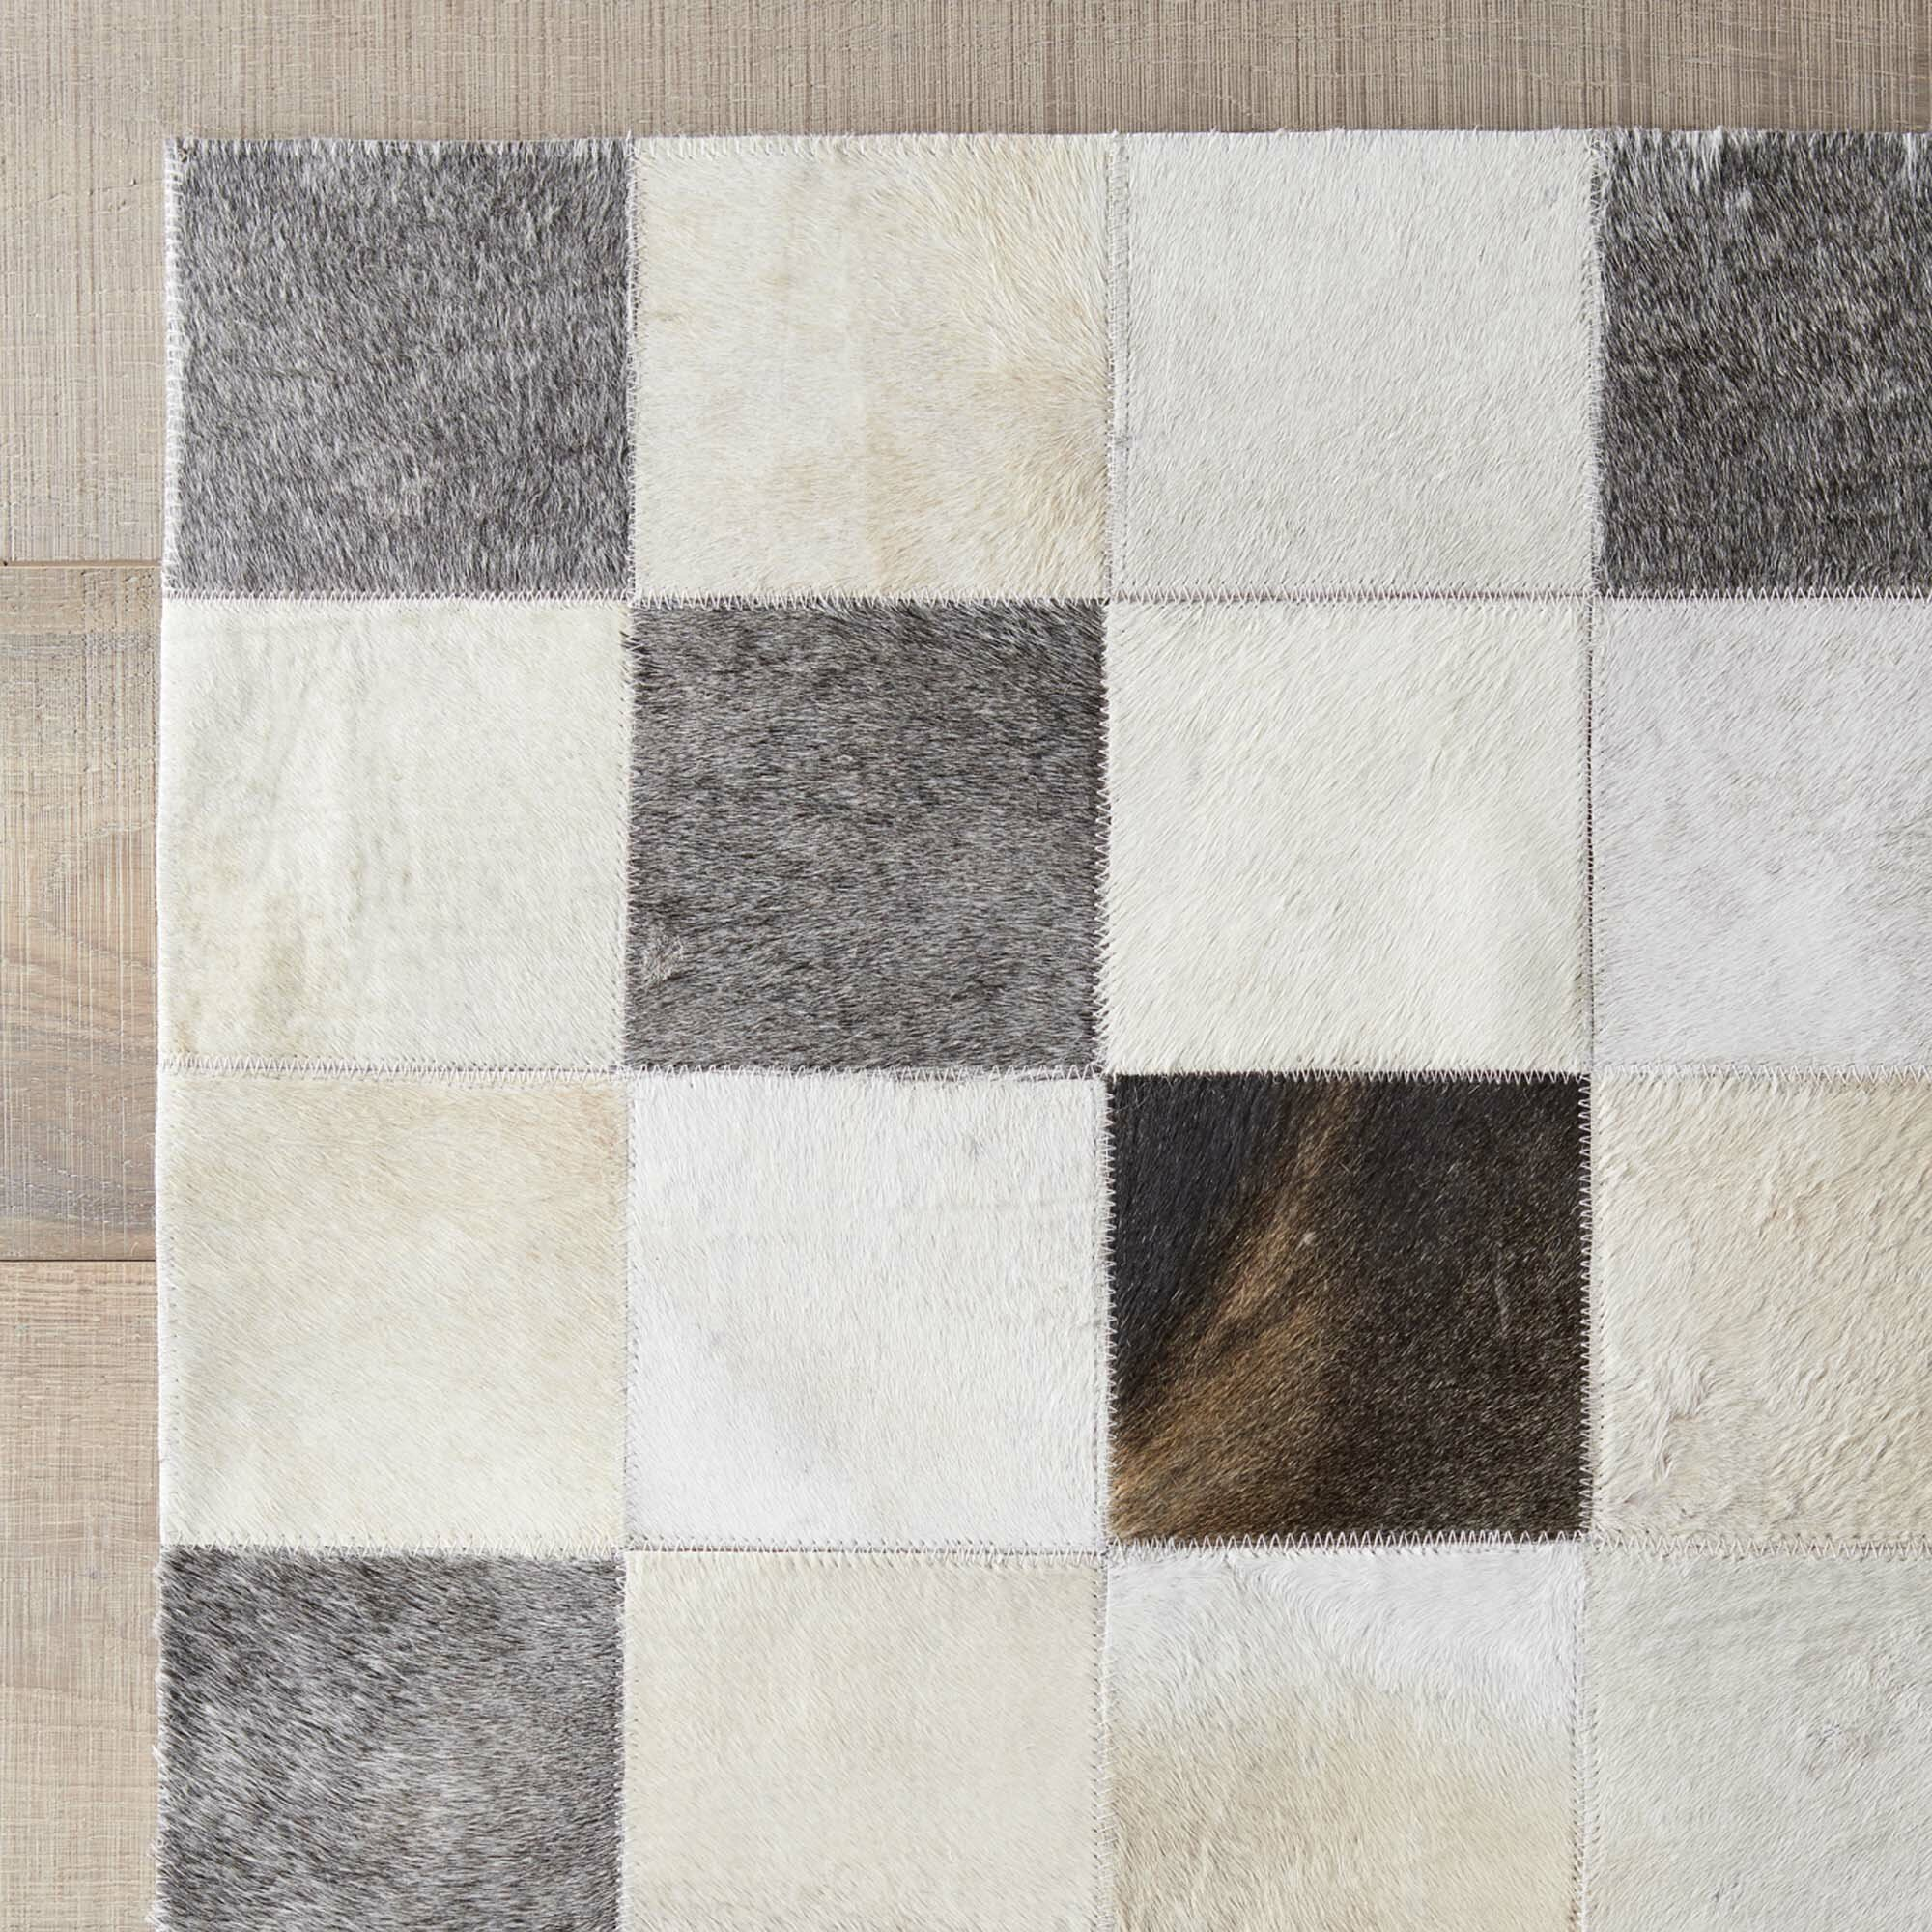 rugs area rugs 5 39 x 8 39 area rugs dwellstudio sku dwl12590